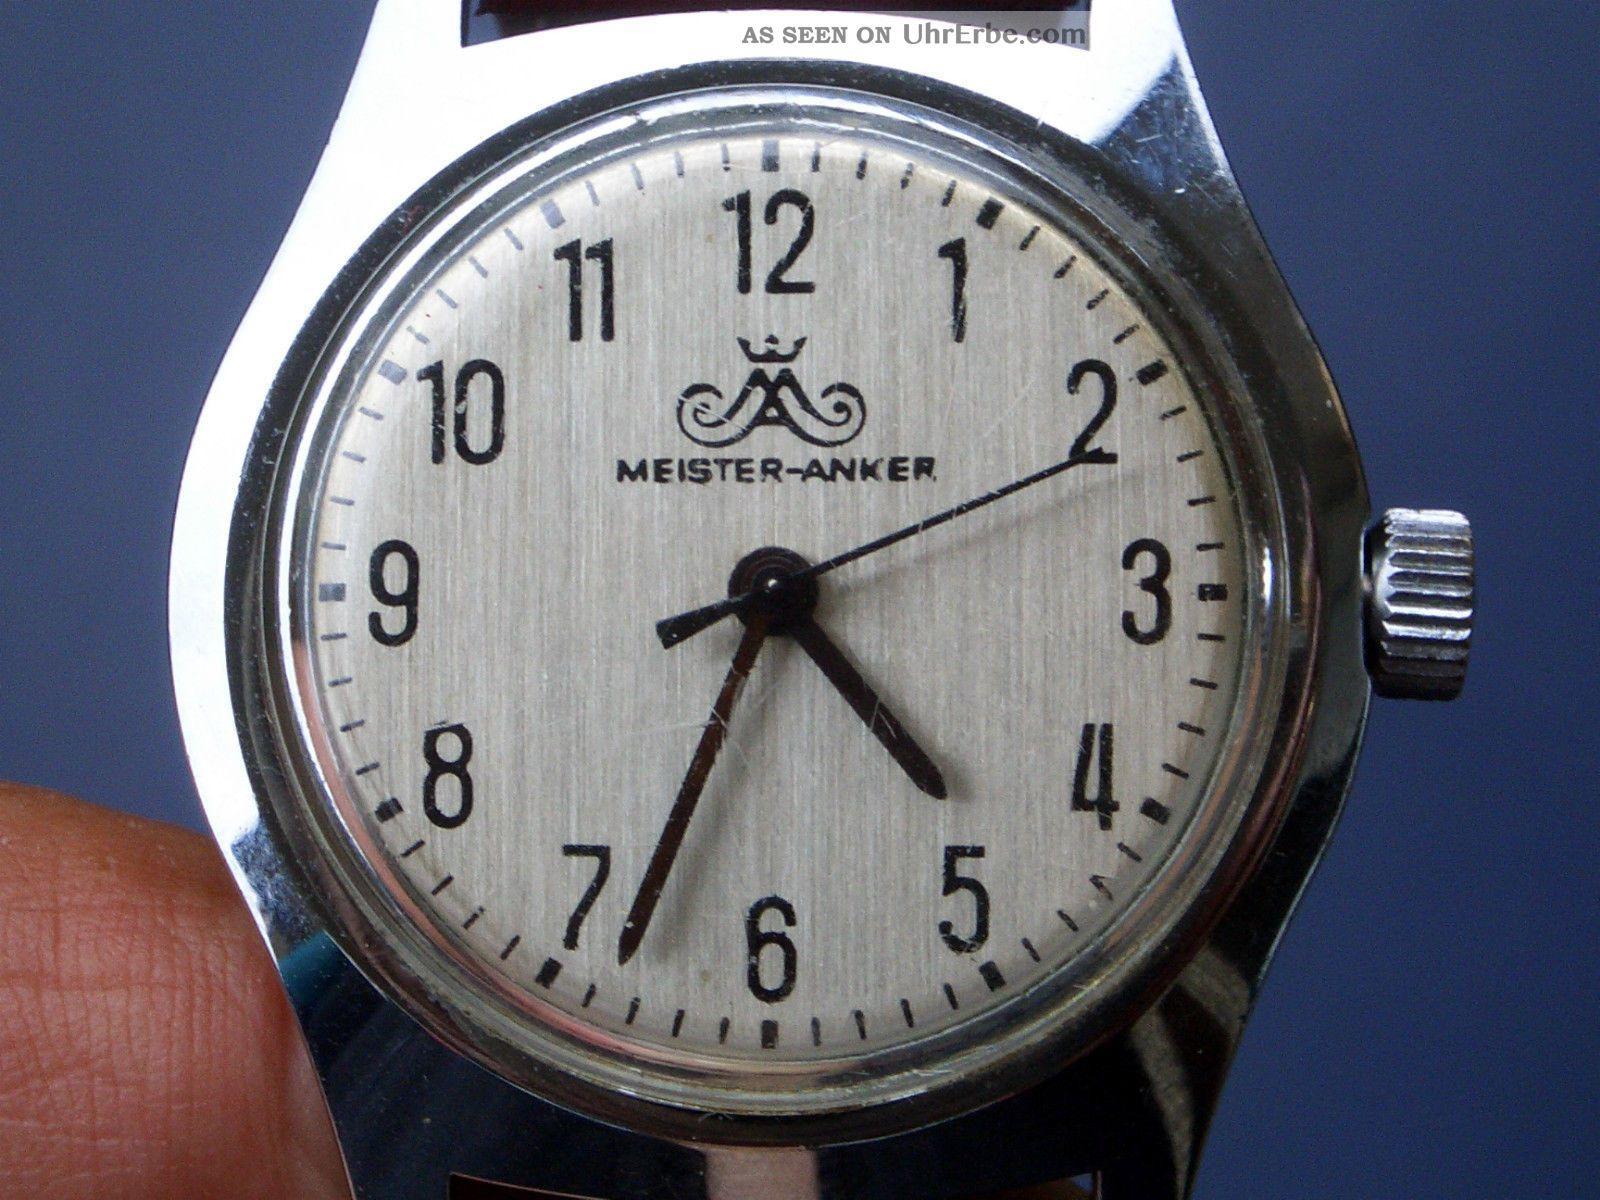 Seltene Mechanische Meister Anker Herrenarmbanduhr Gut Erhalten Läuft Gut. Armbanduhren Bild